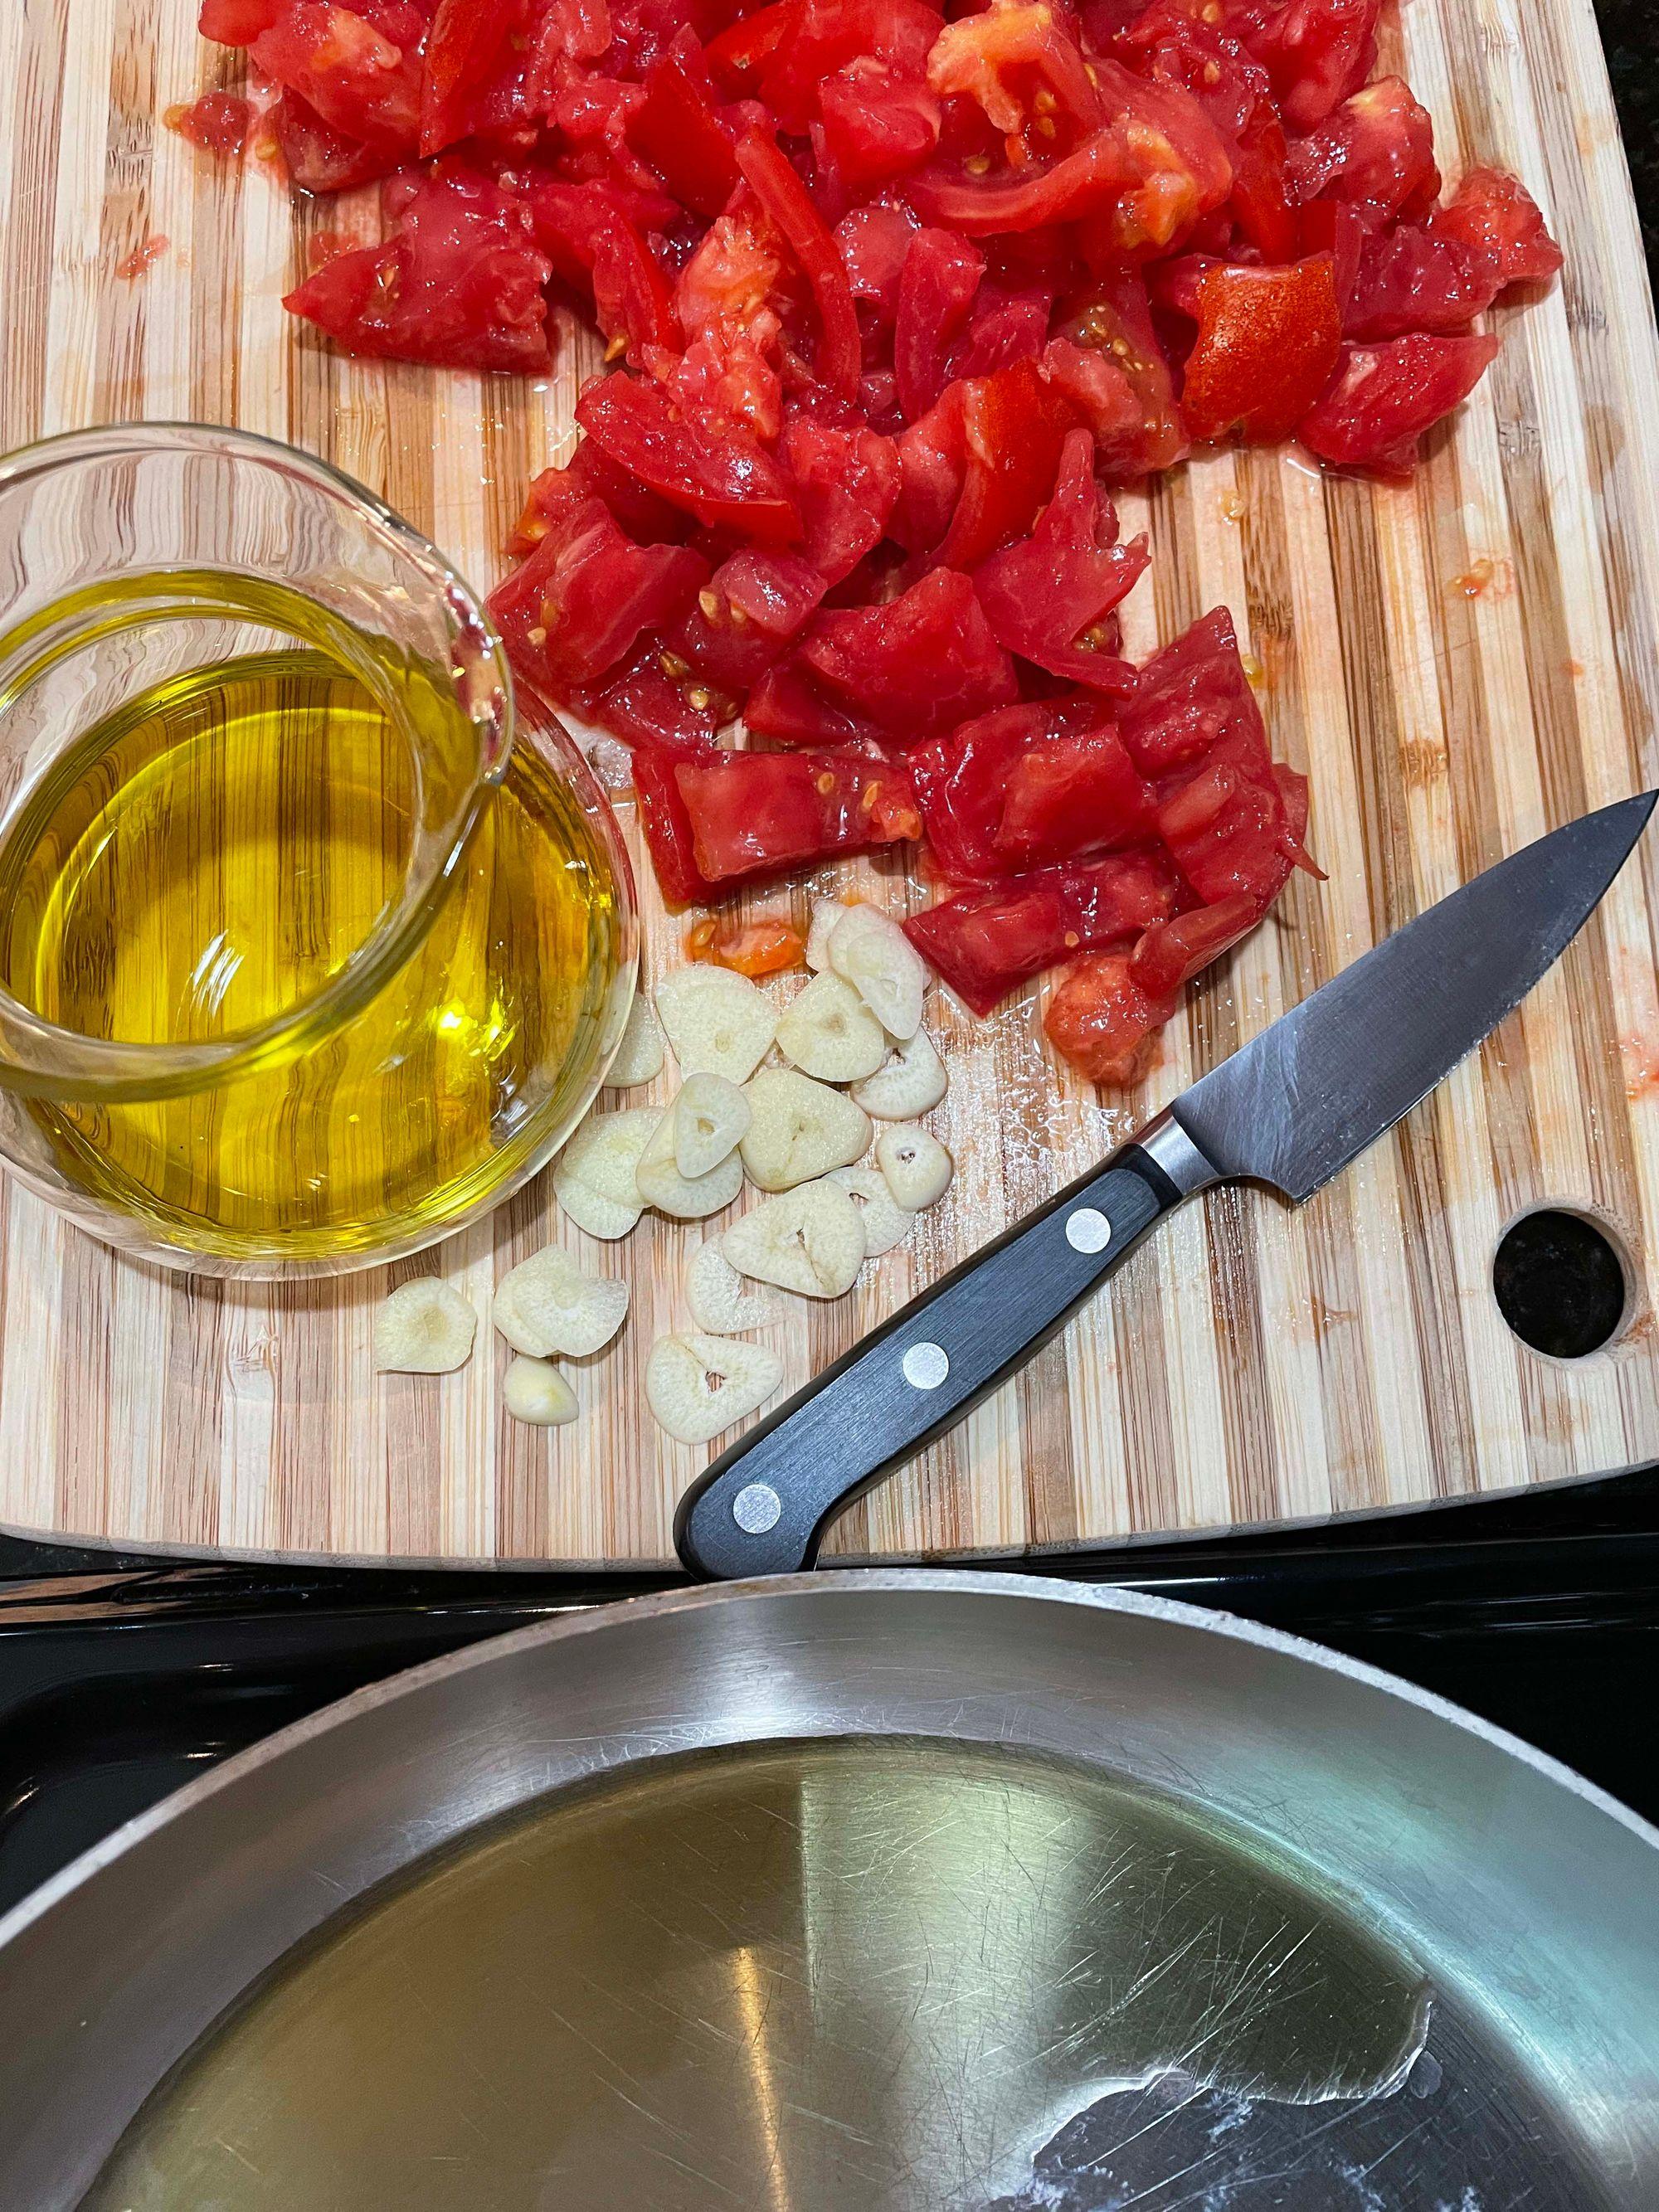 Making Quick Fresh Tomato Sauce